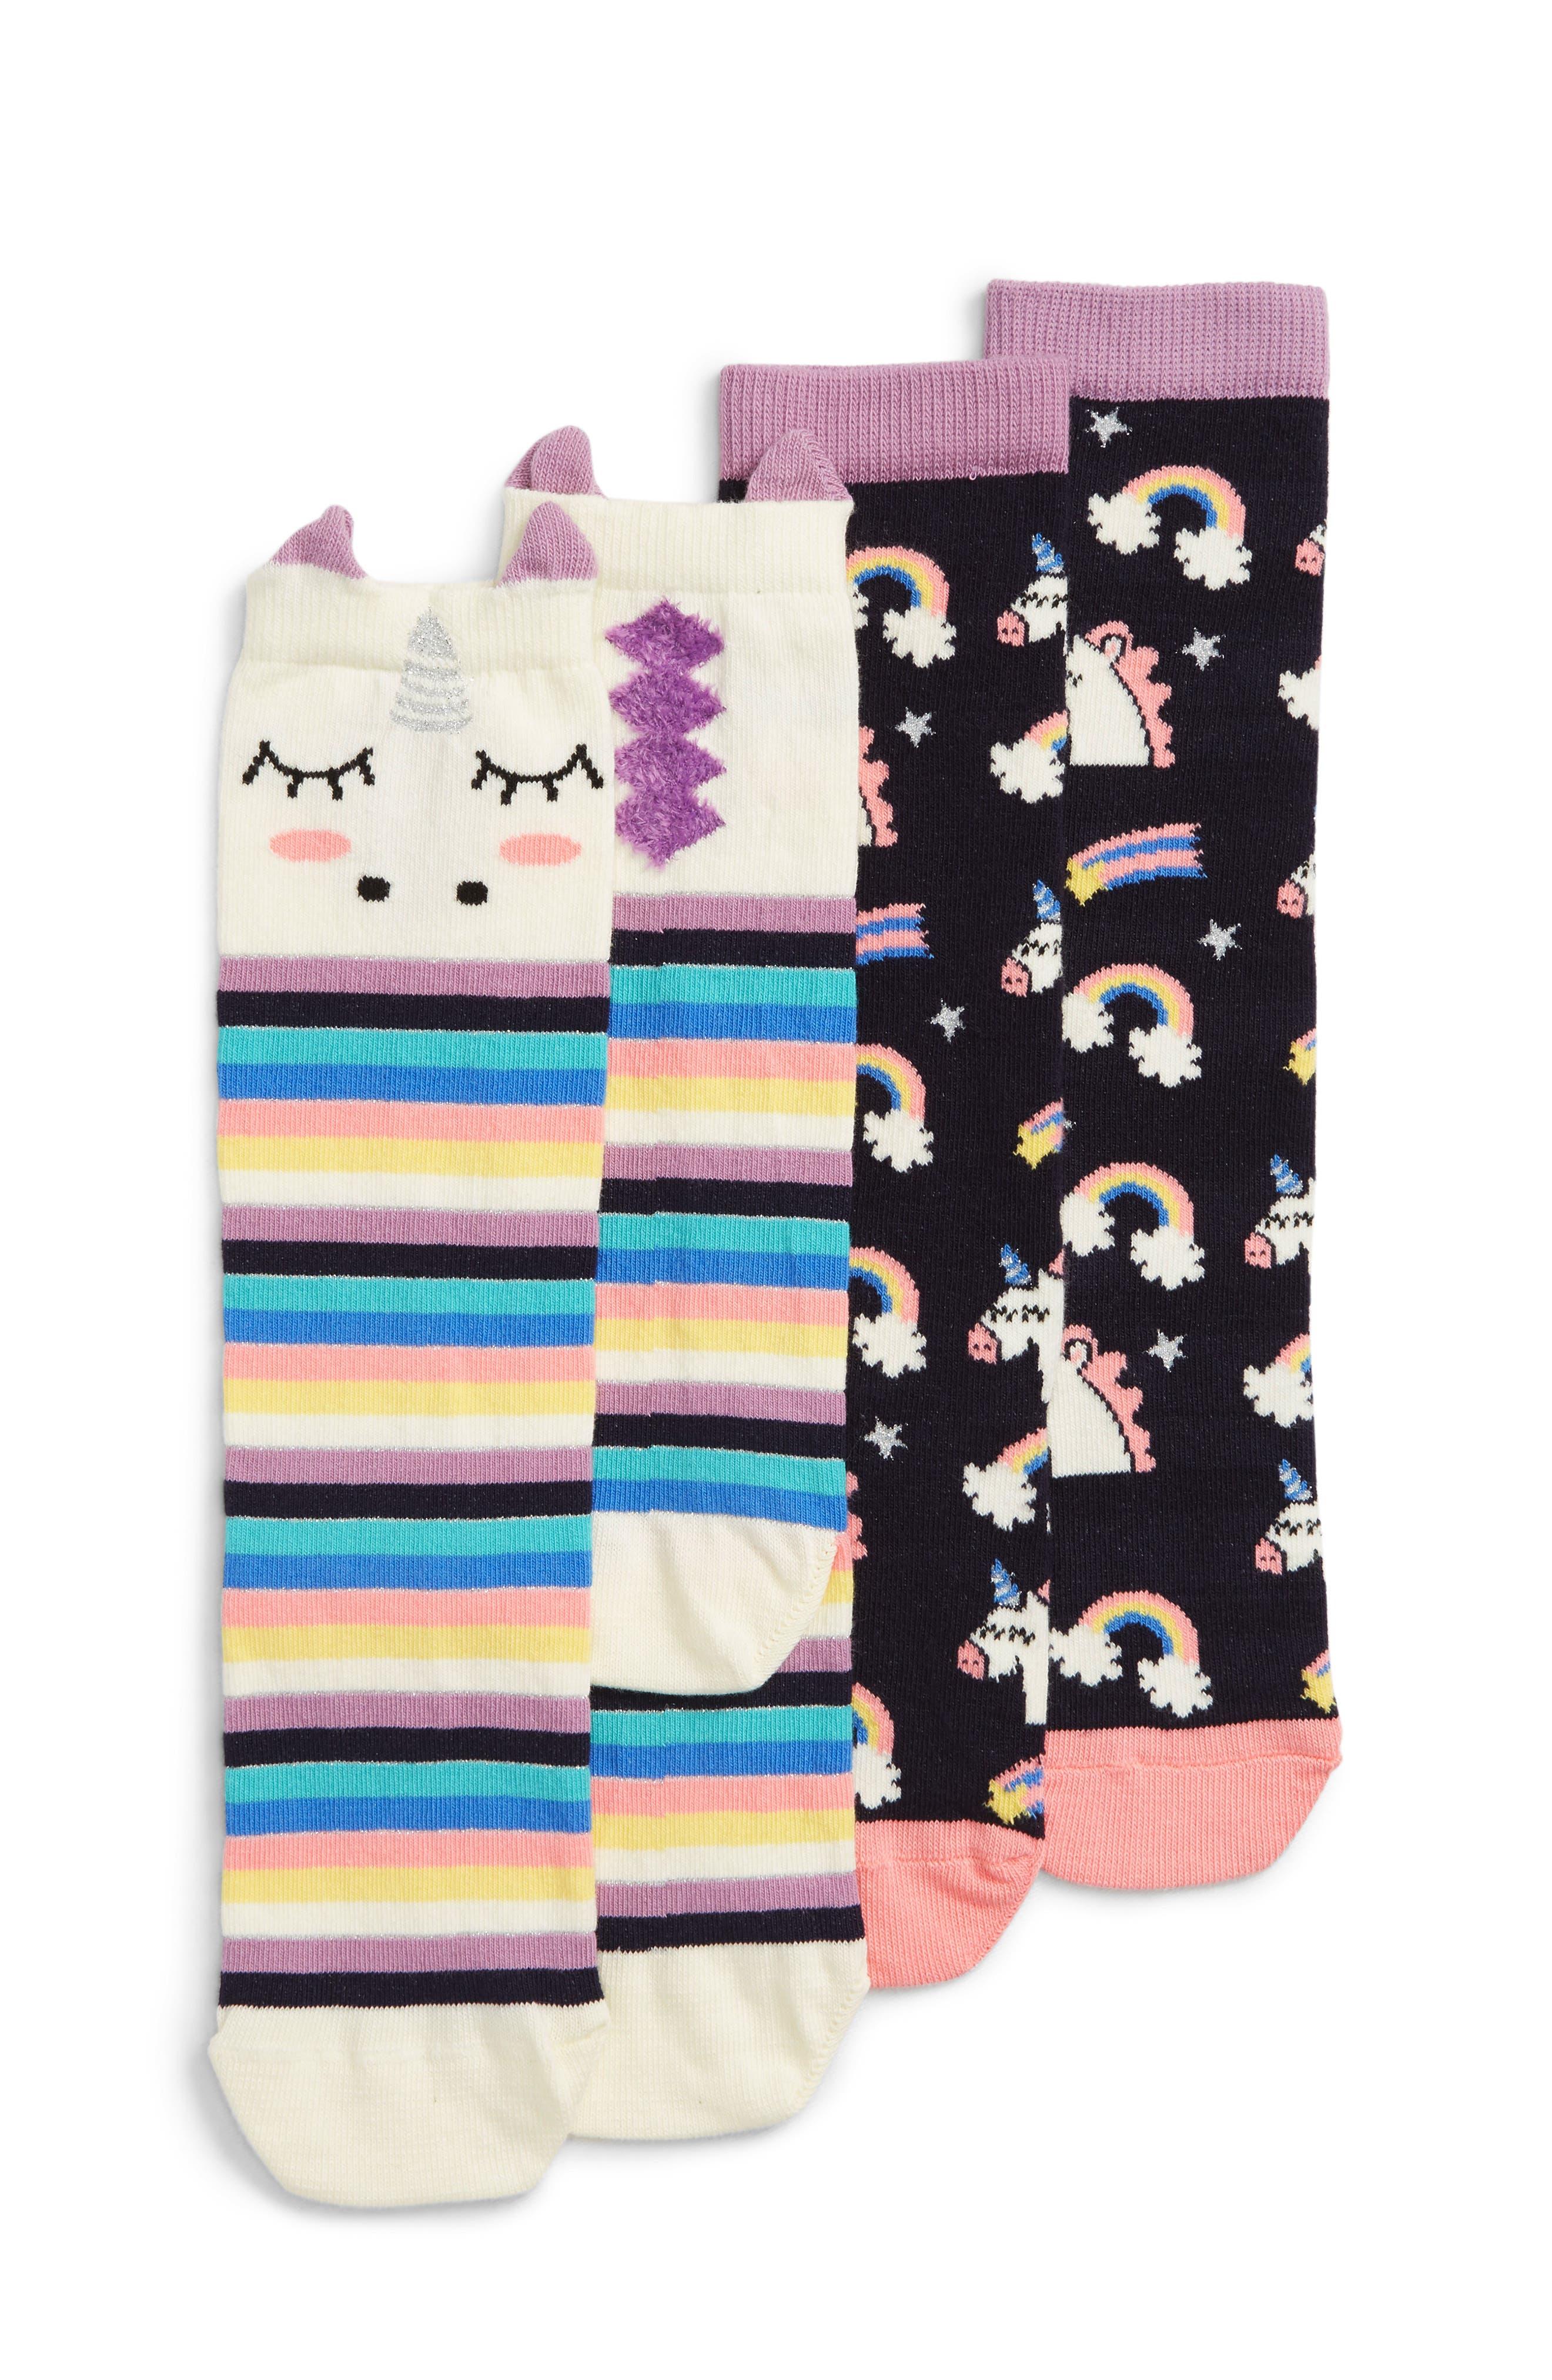 2-Pack Rainbows & Unicorns Knee High Socks,                         Main,                         color, 101